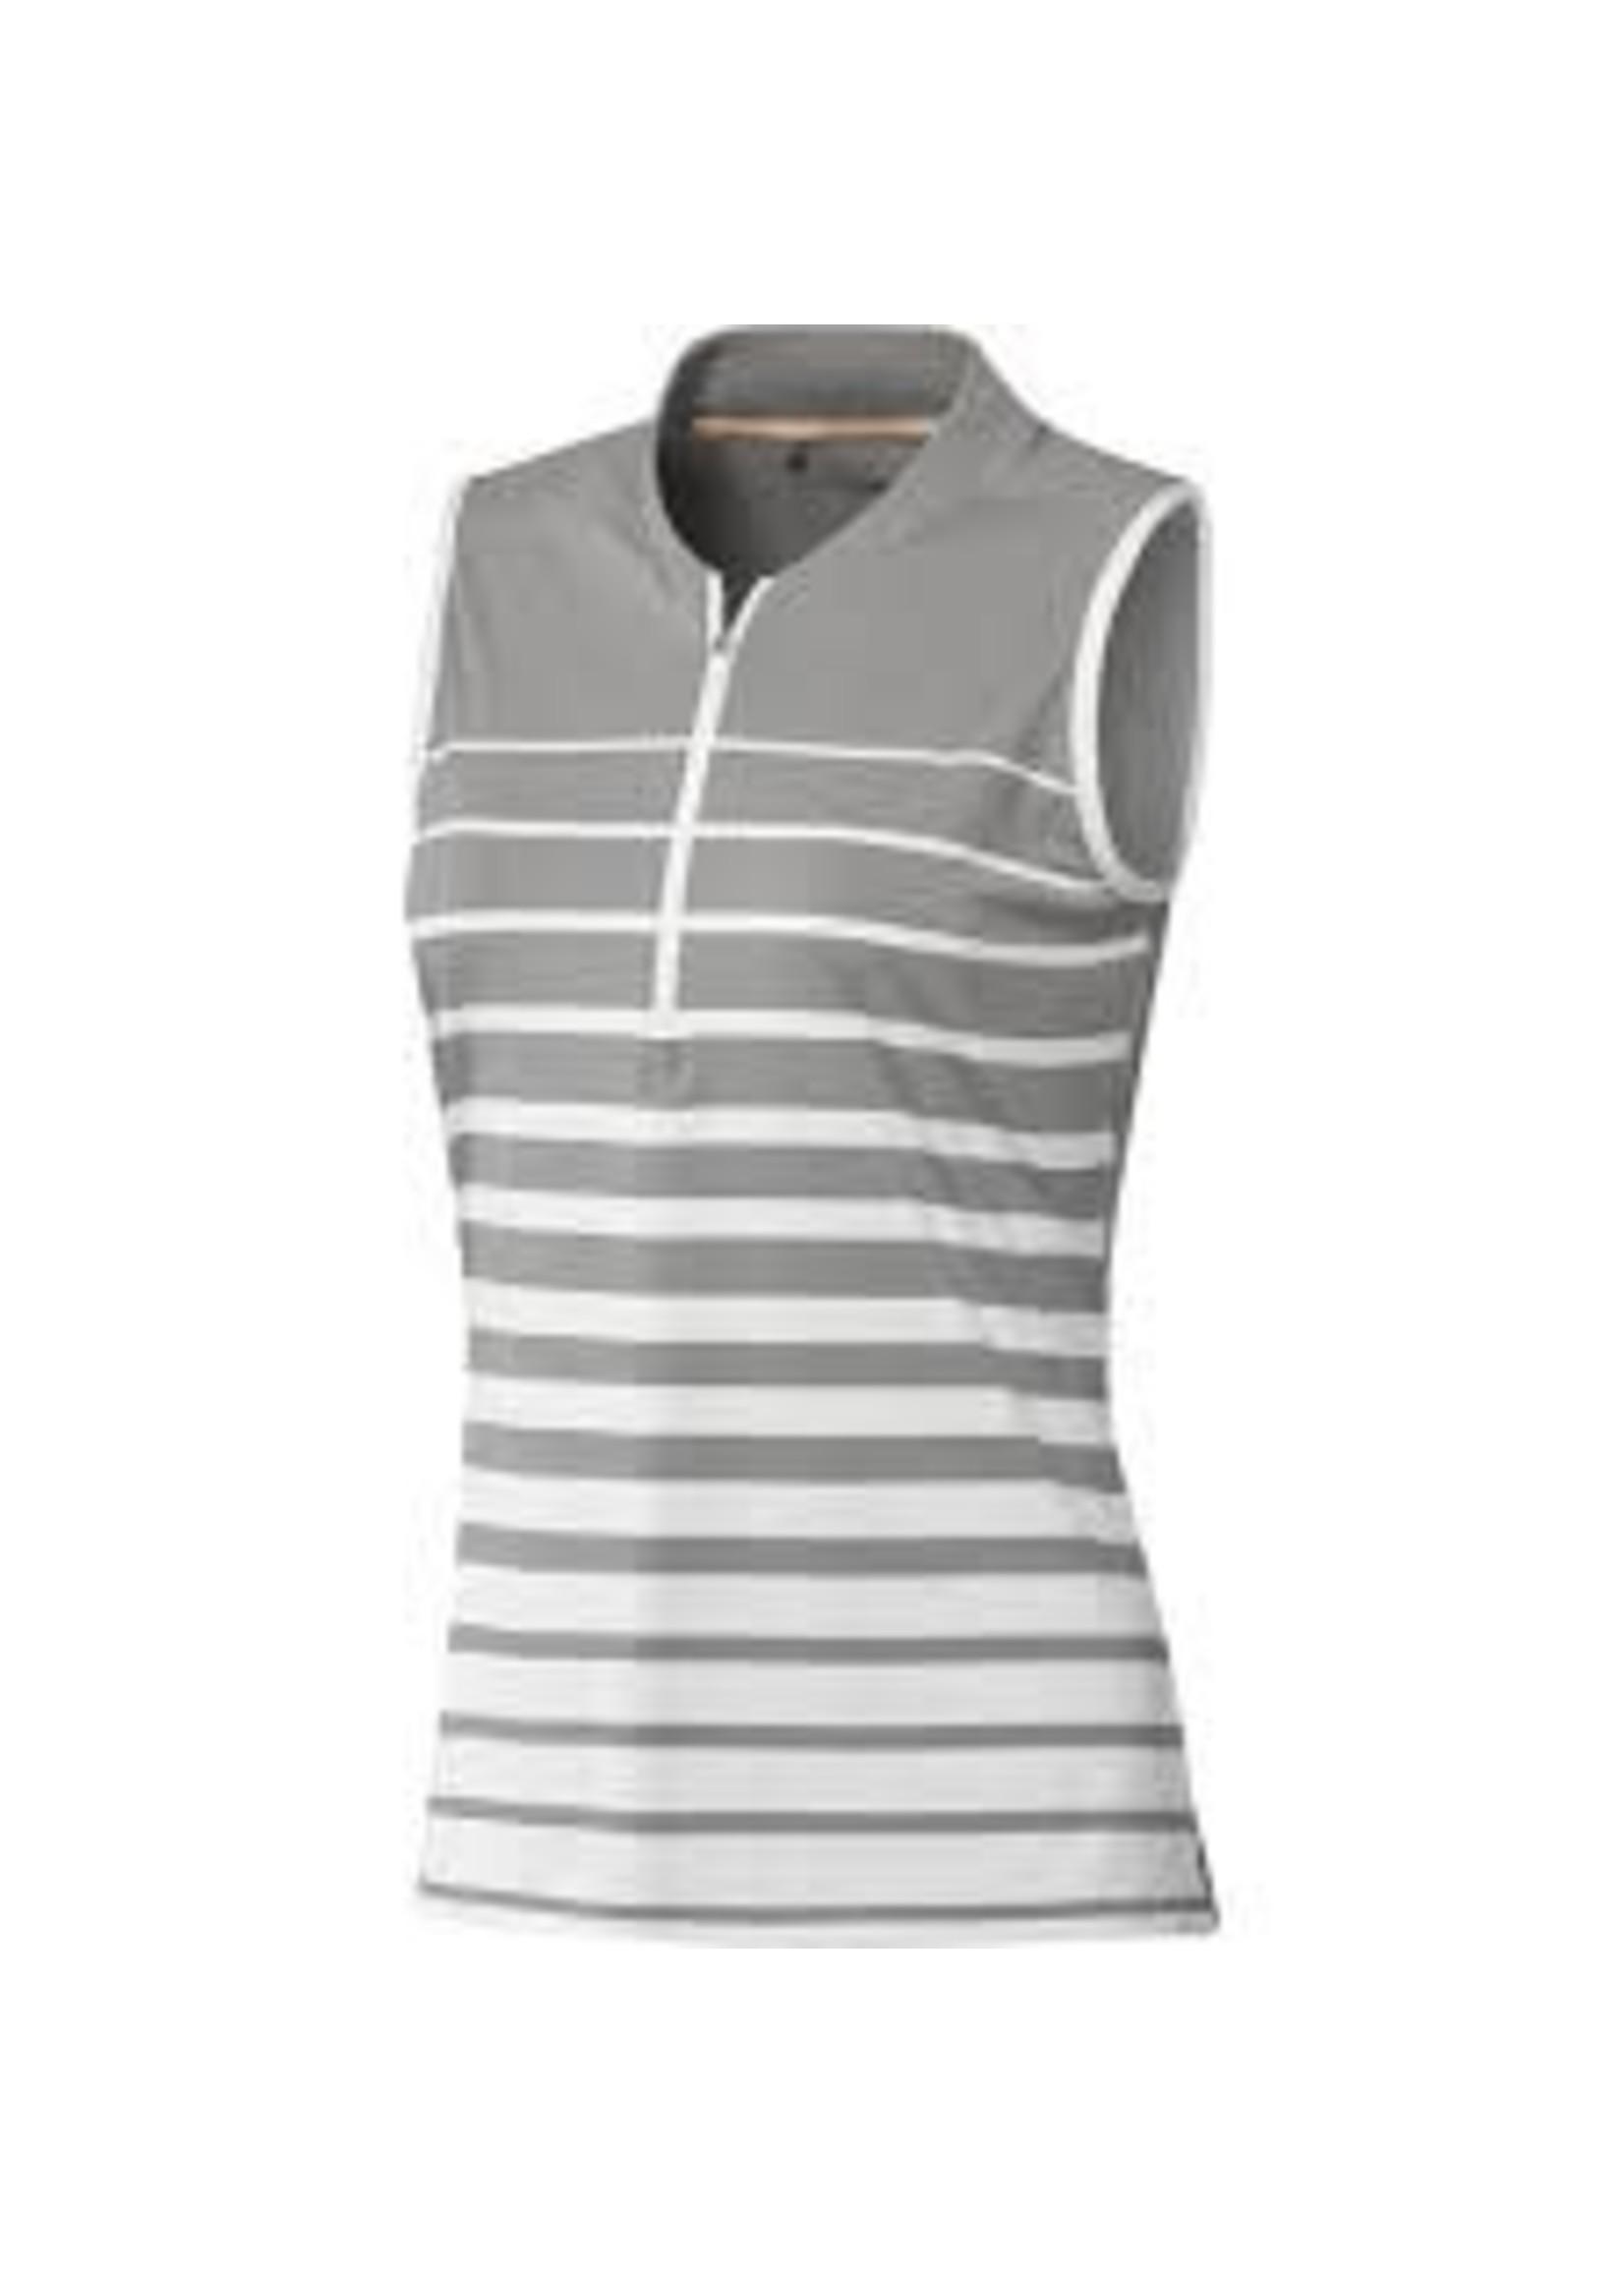 Adidas Adidas FP7699 Sleeveless Polo Shirt Engineered Stripe Grey (2020)